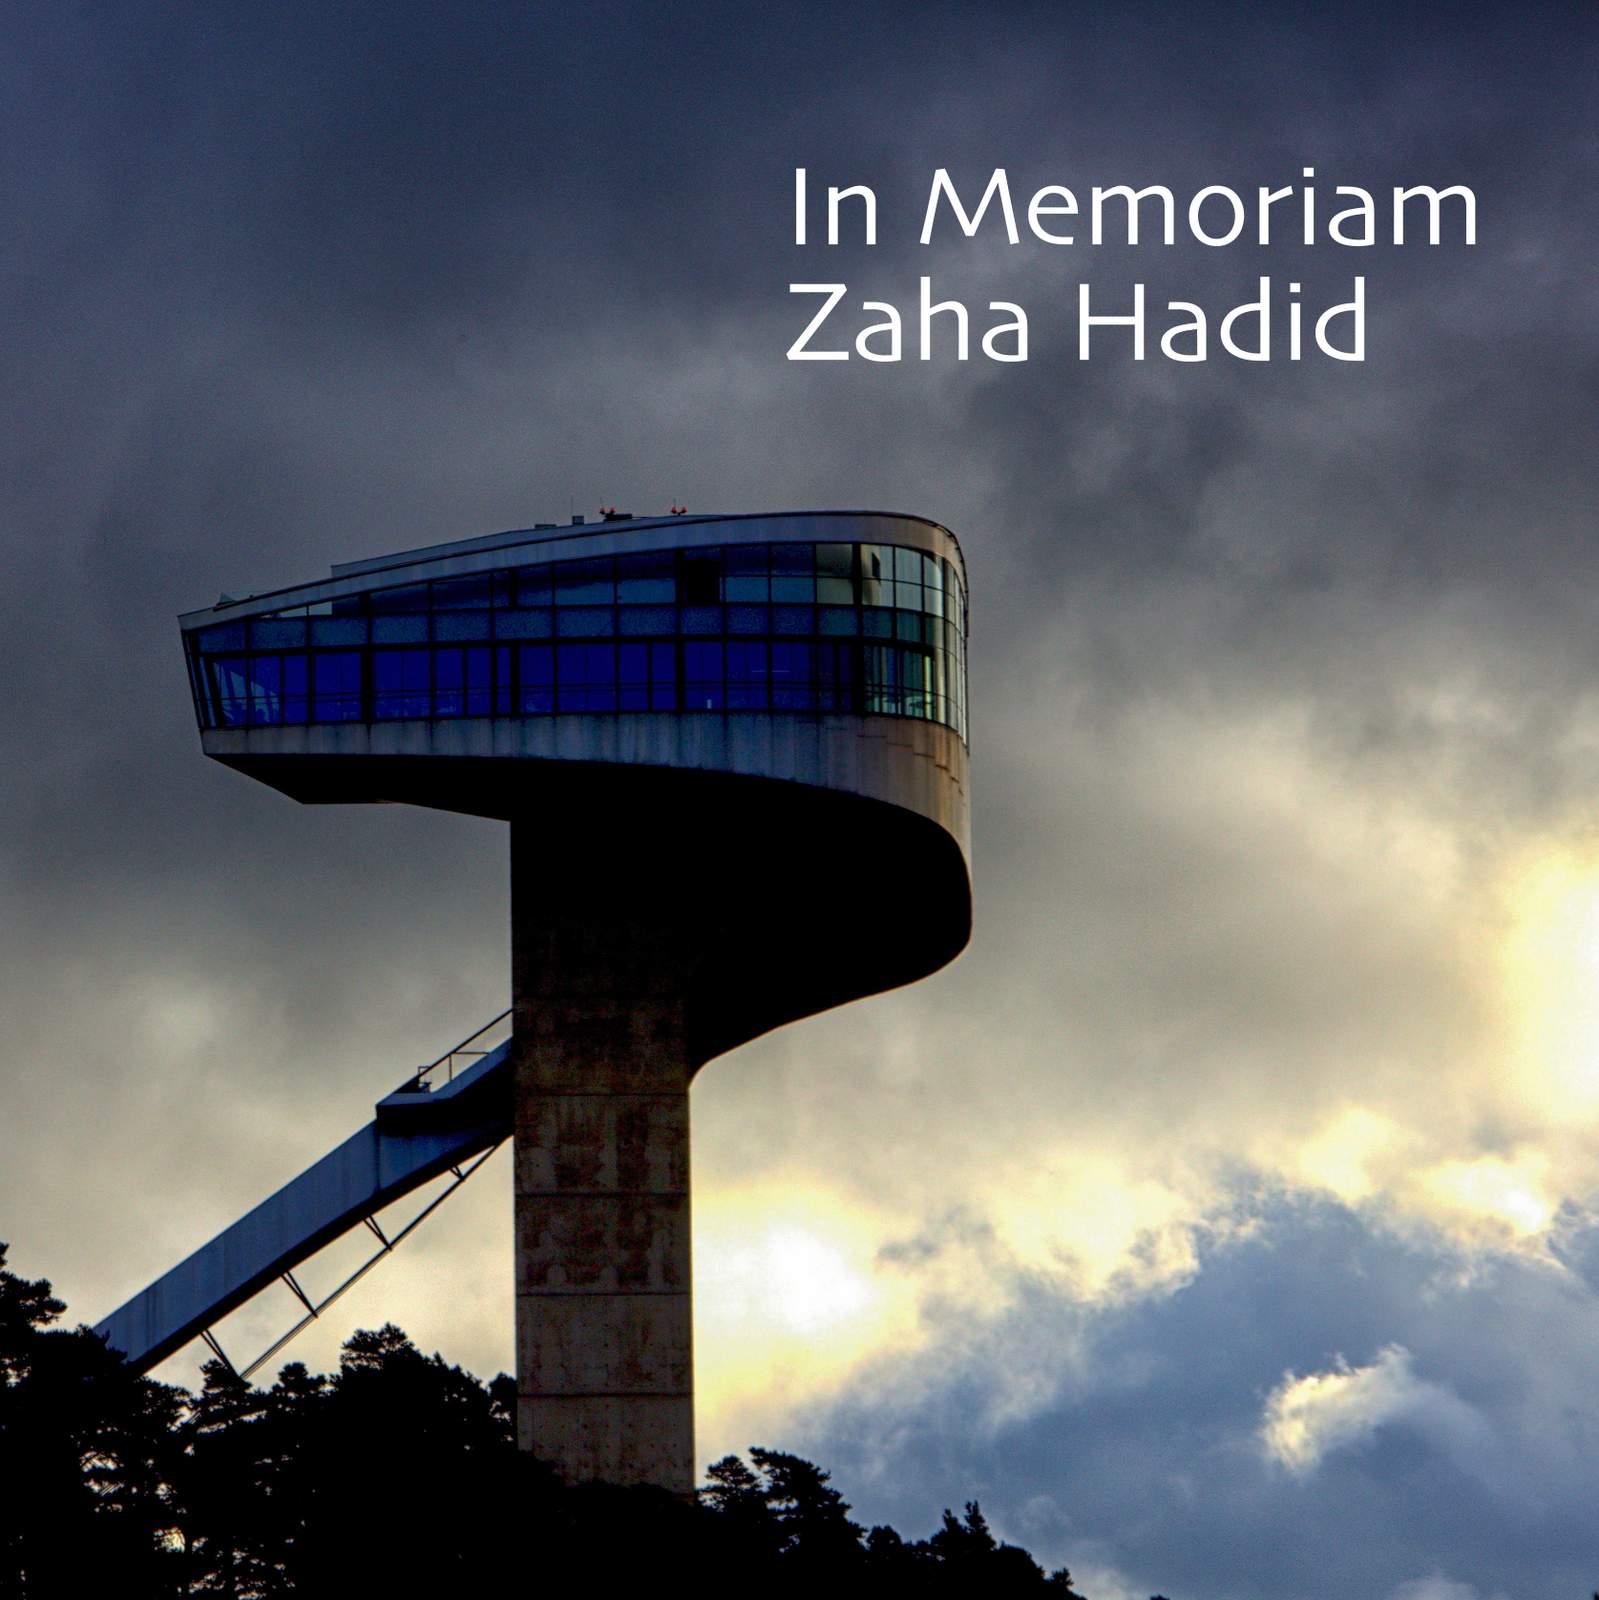 In Memoriam of Zaha Hadid